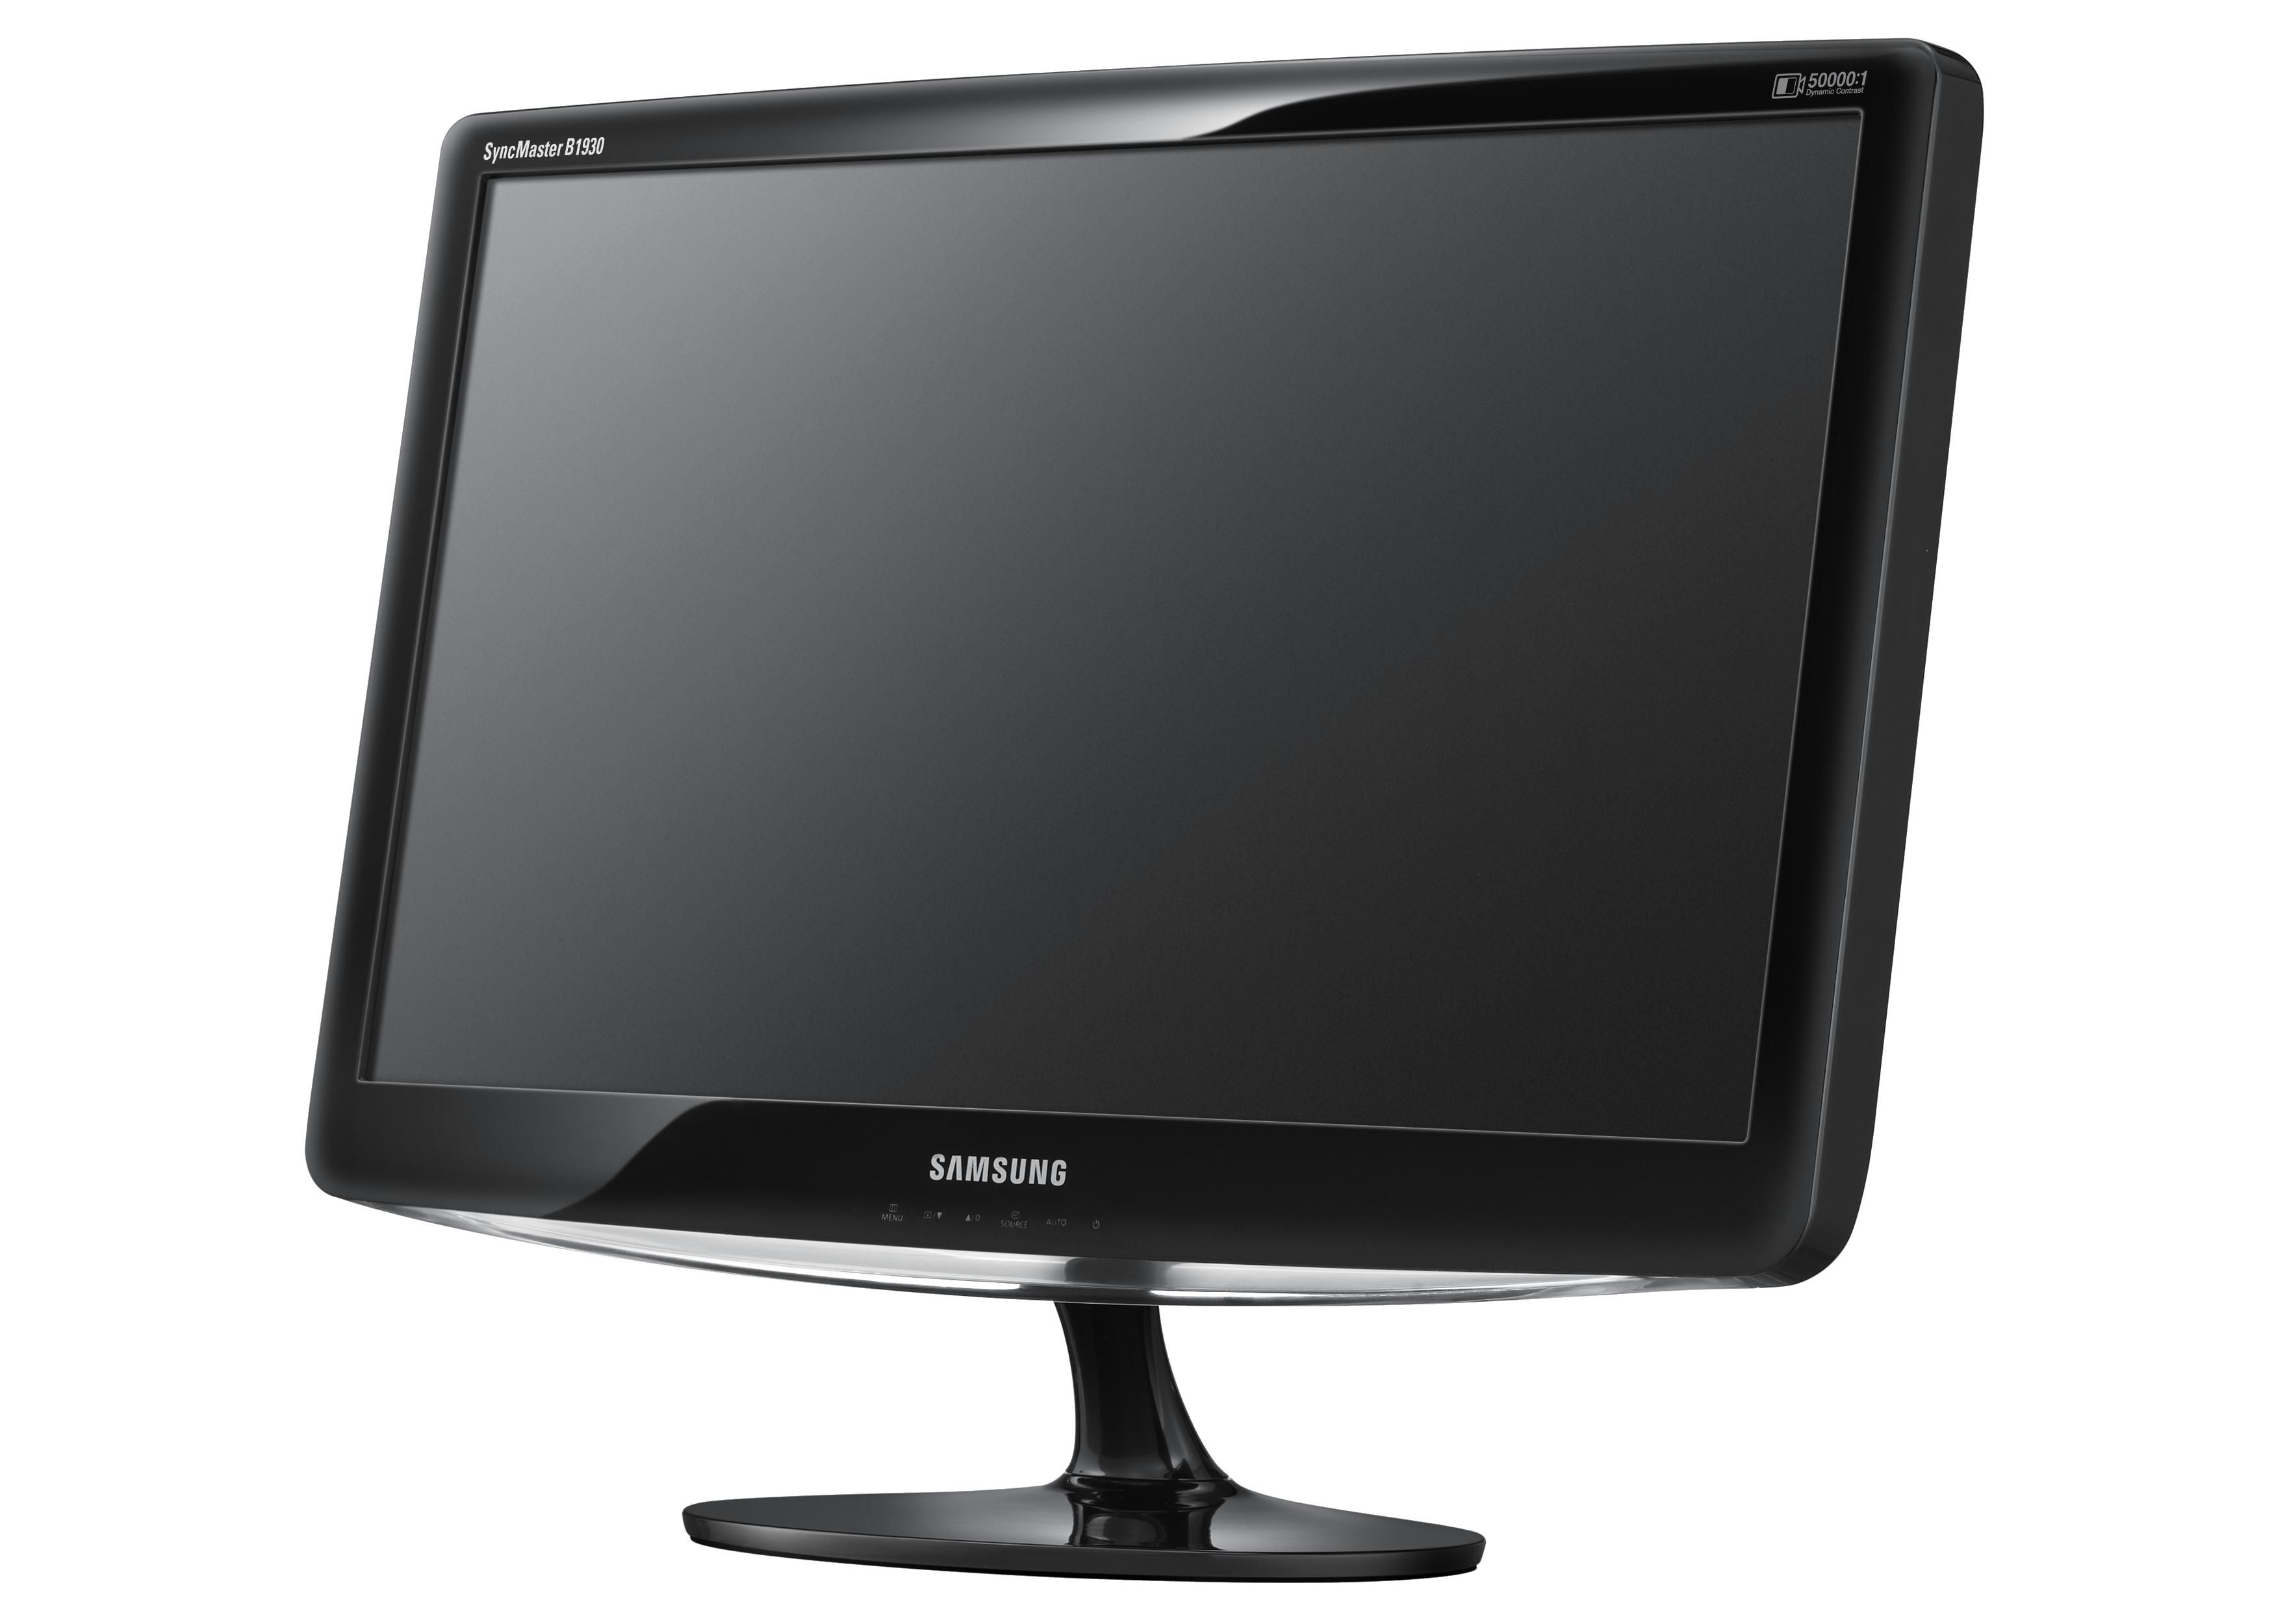 Computer clipart transparent background. Laptop adamsmanor net png